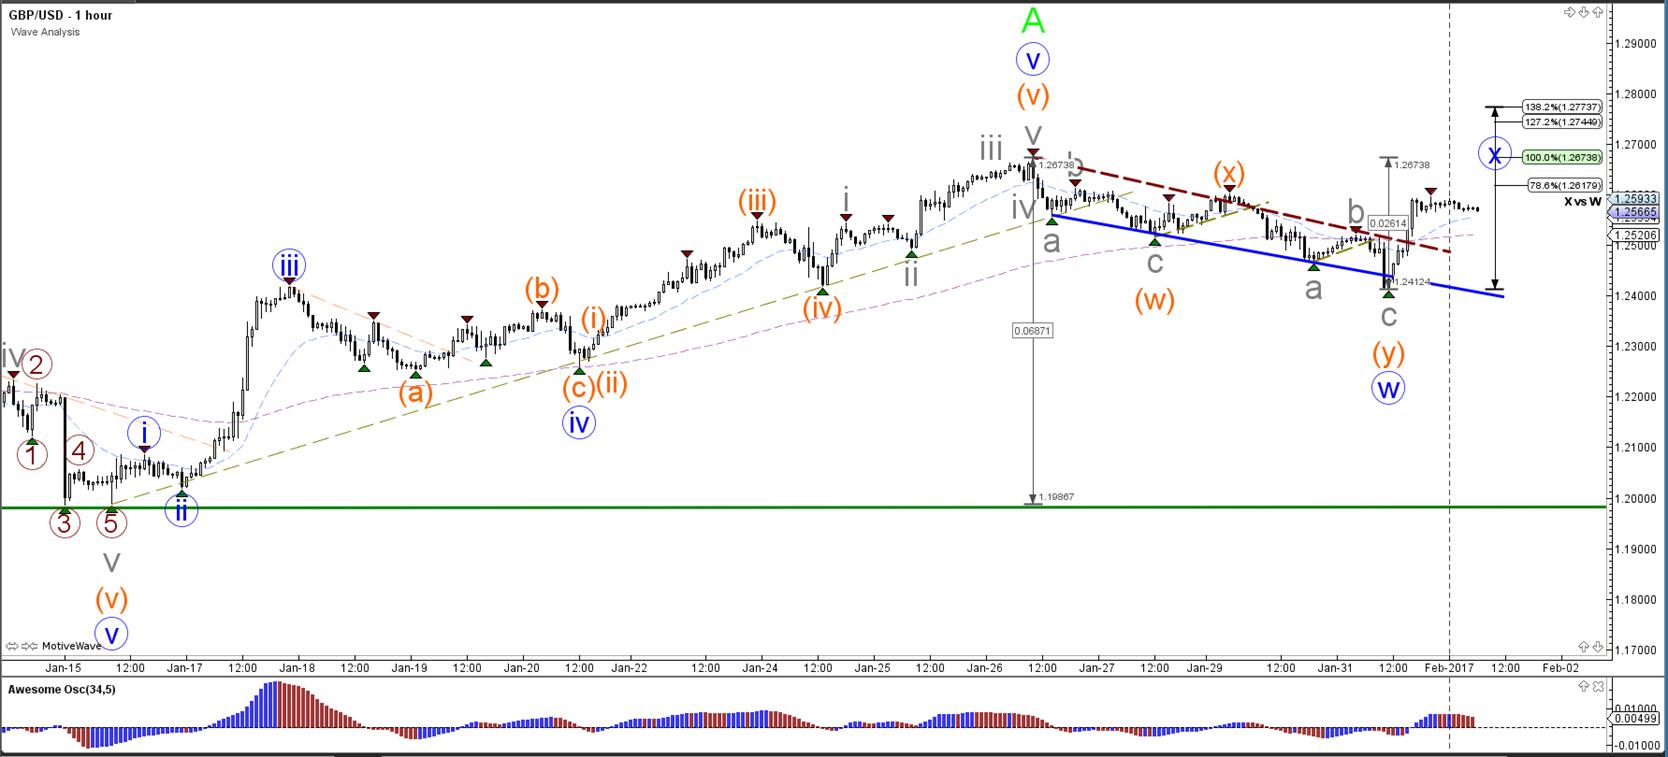 EUR/USD bullish turn has reached key 88 6% Fibonacci resistance